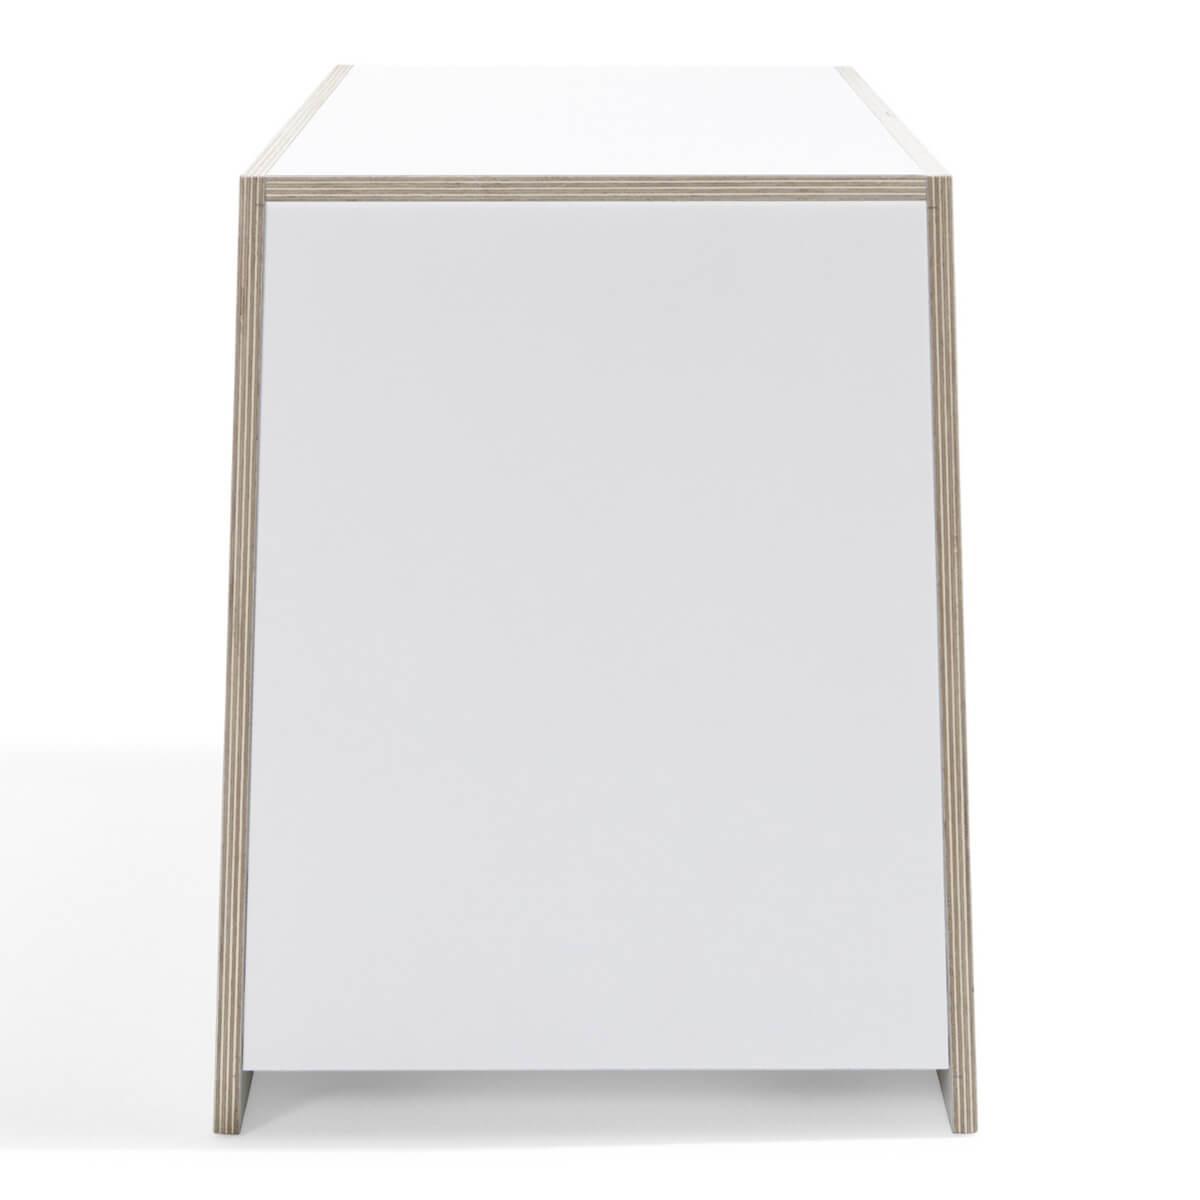 Estantería-módulo BOXIT Mueller blanco